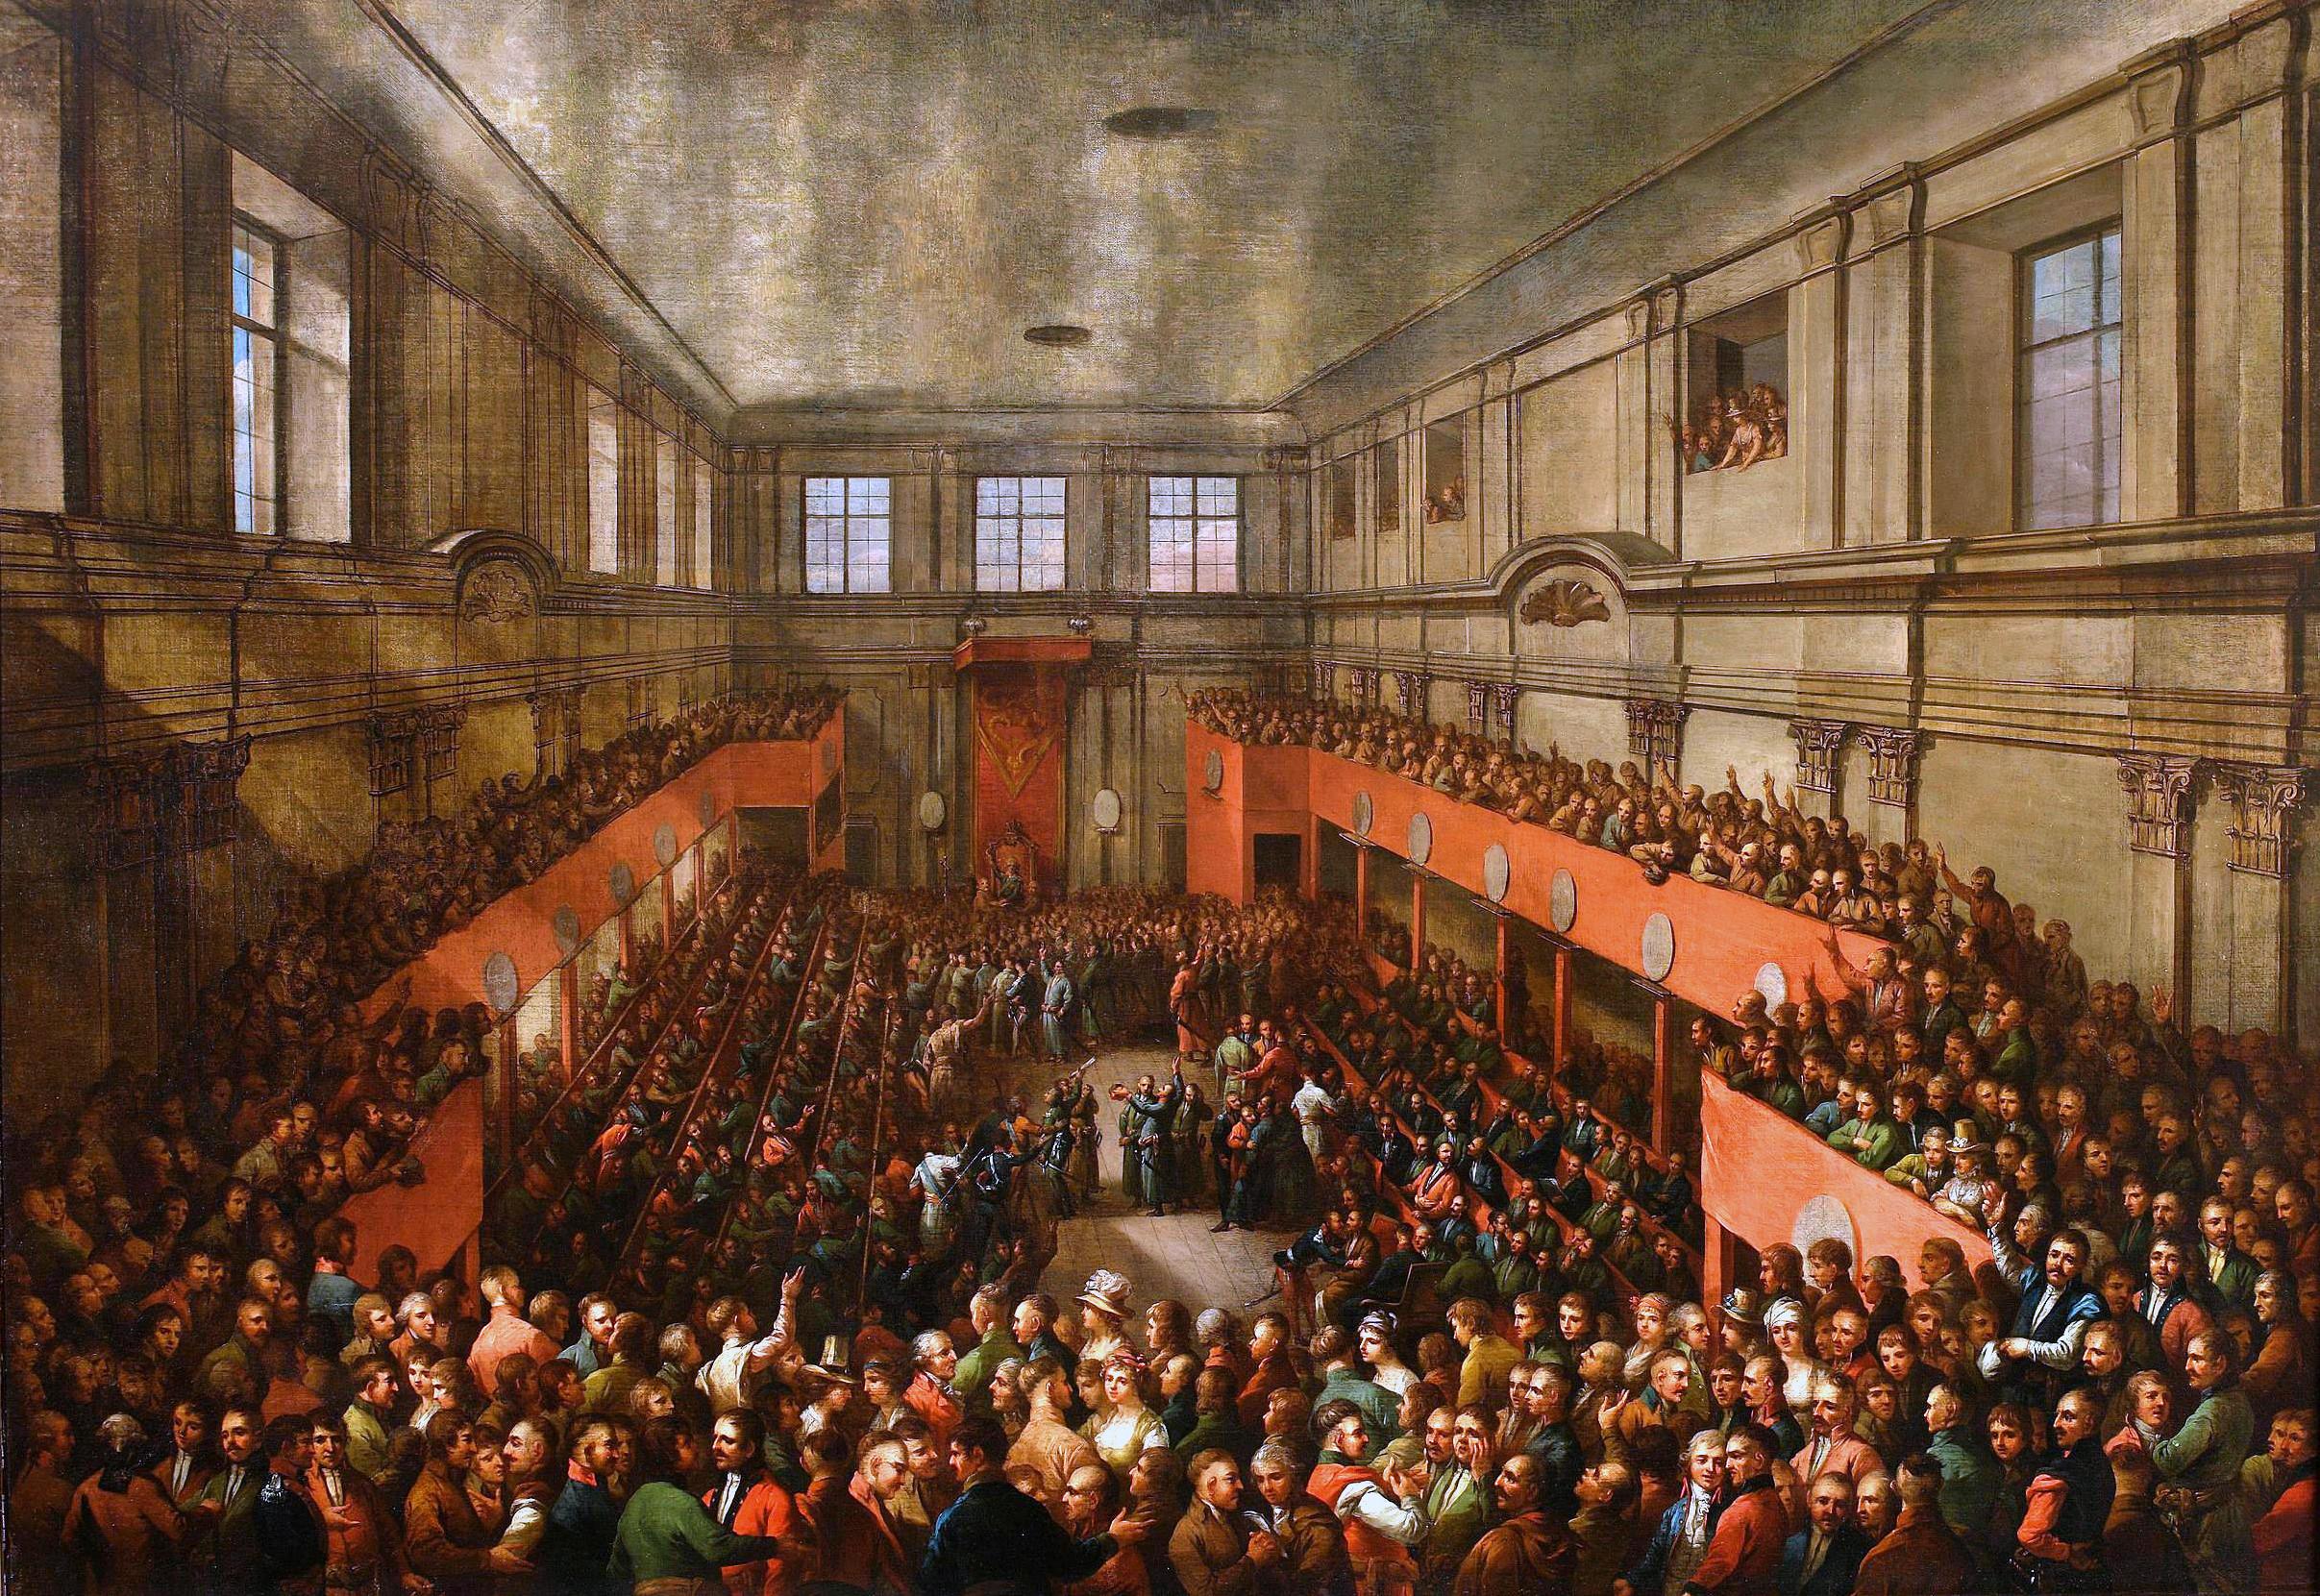 adoption_of_the_constitution_on_may_3_1791_by_kazimierz_wojniakowski_1806  Foto: http://cyfrowe.mnw.art.pl/dmuseion/docmetadata?id=5327